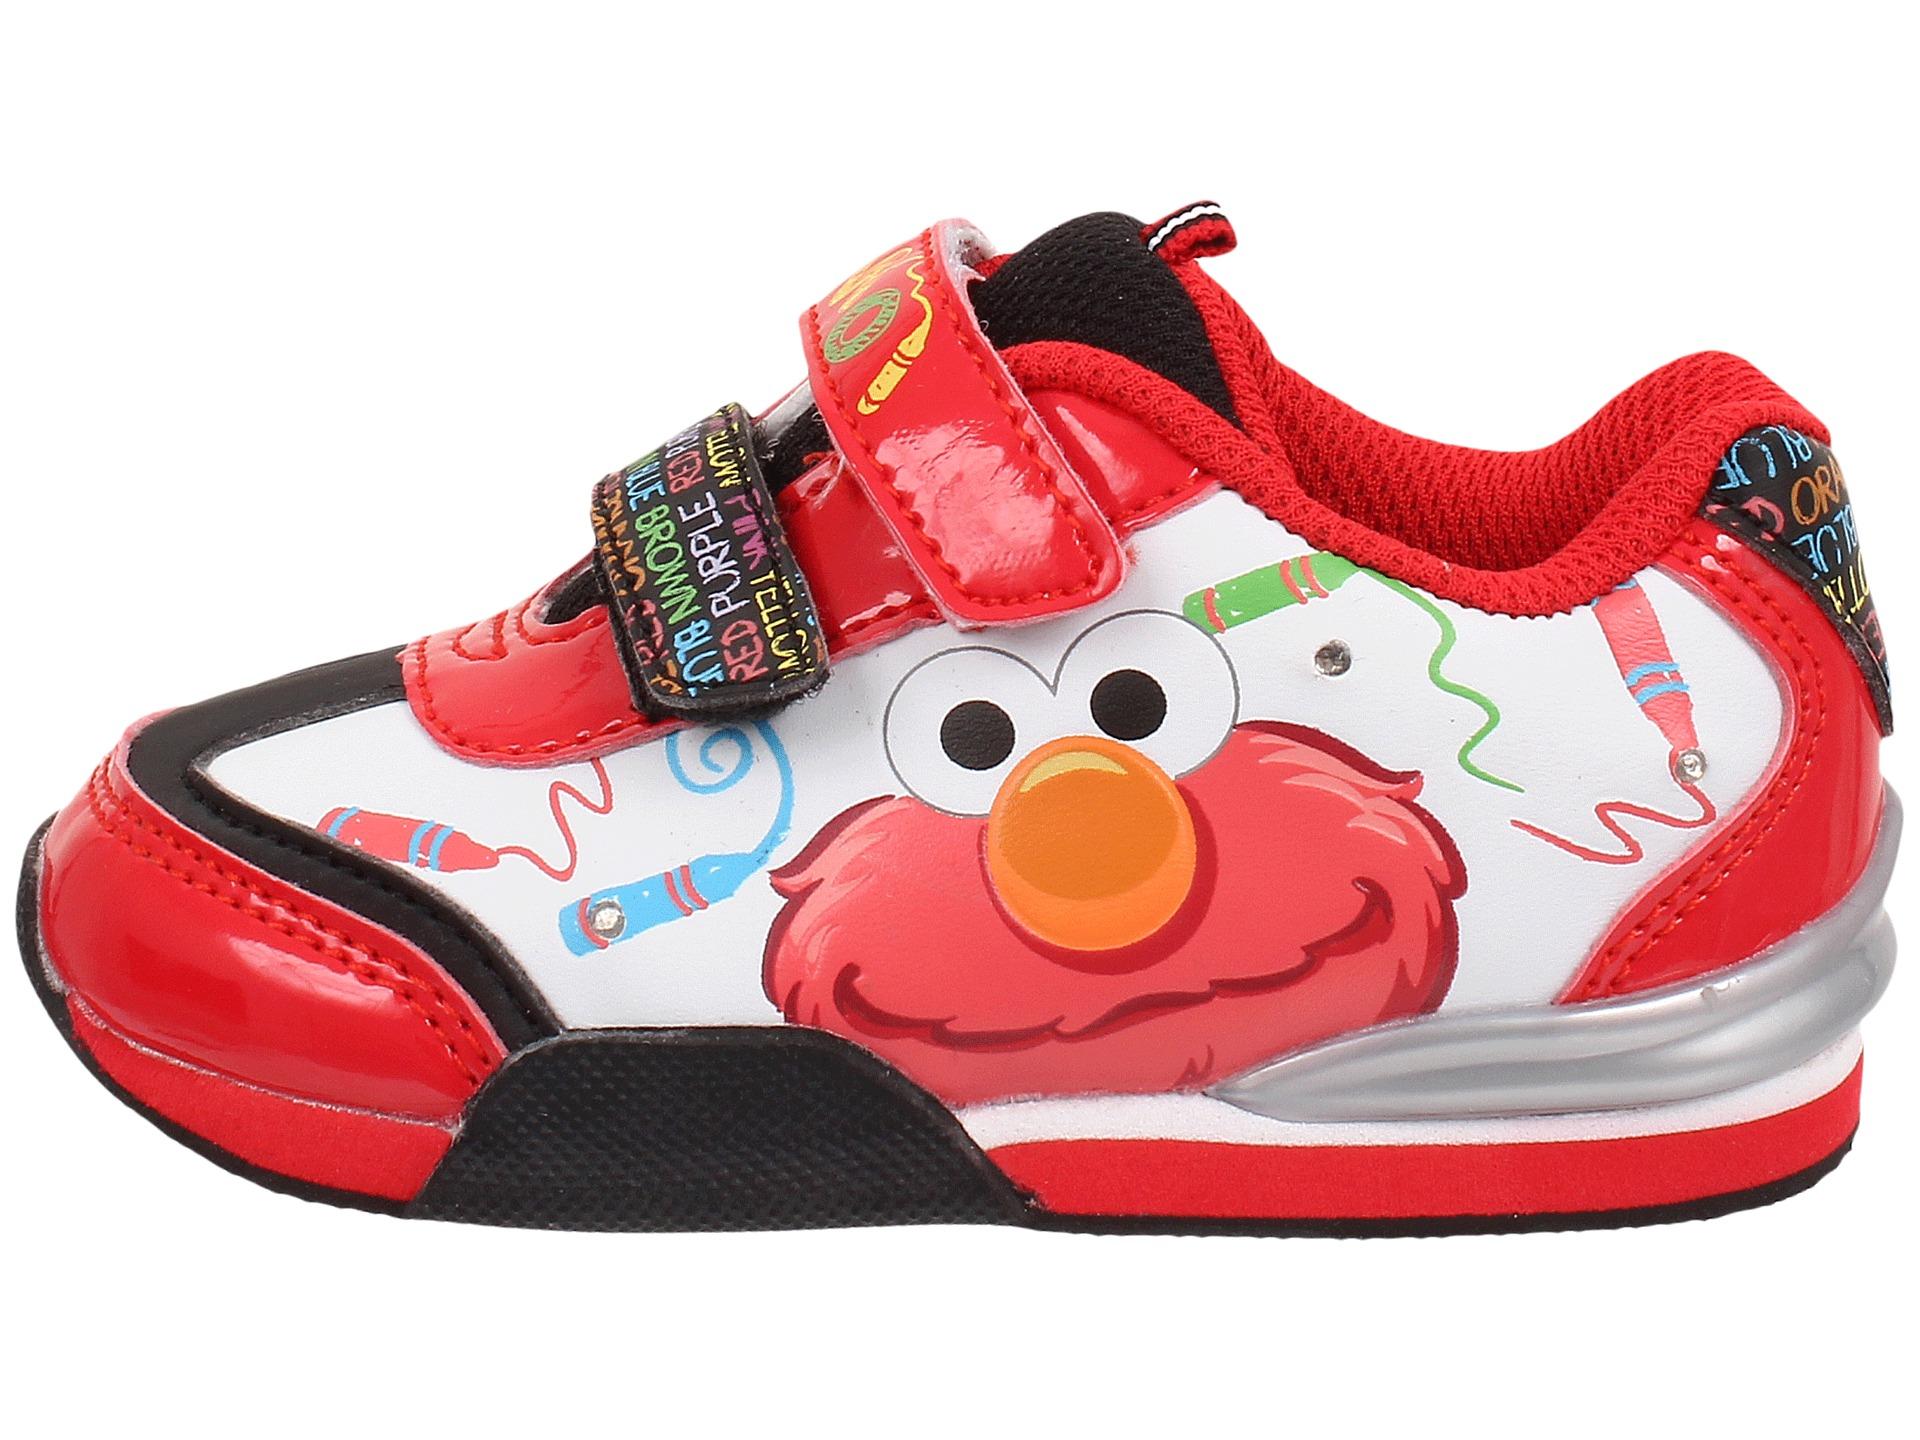 Favorite Characters Sesame Street Elmo Sef Lighted